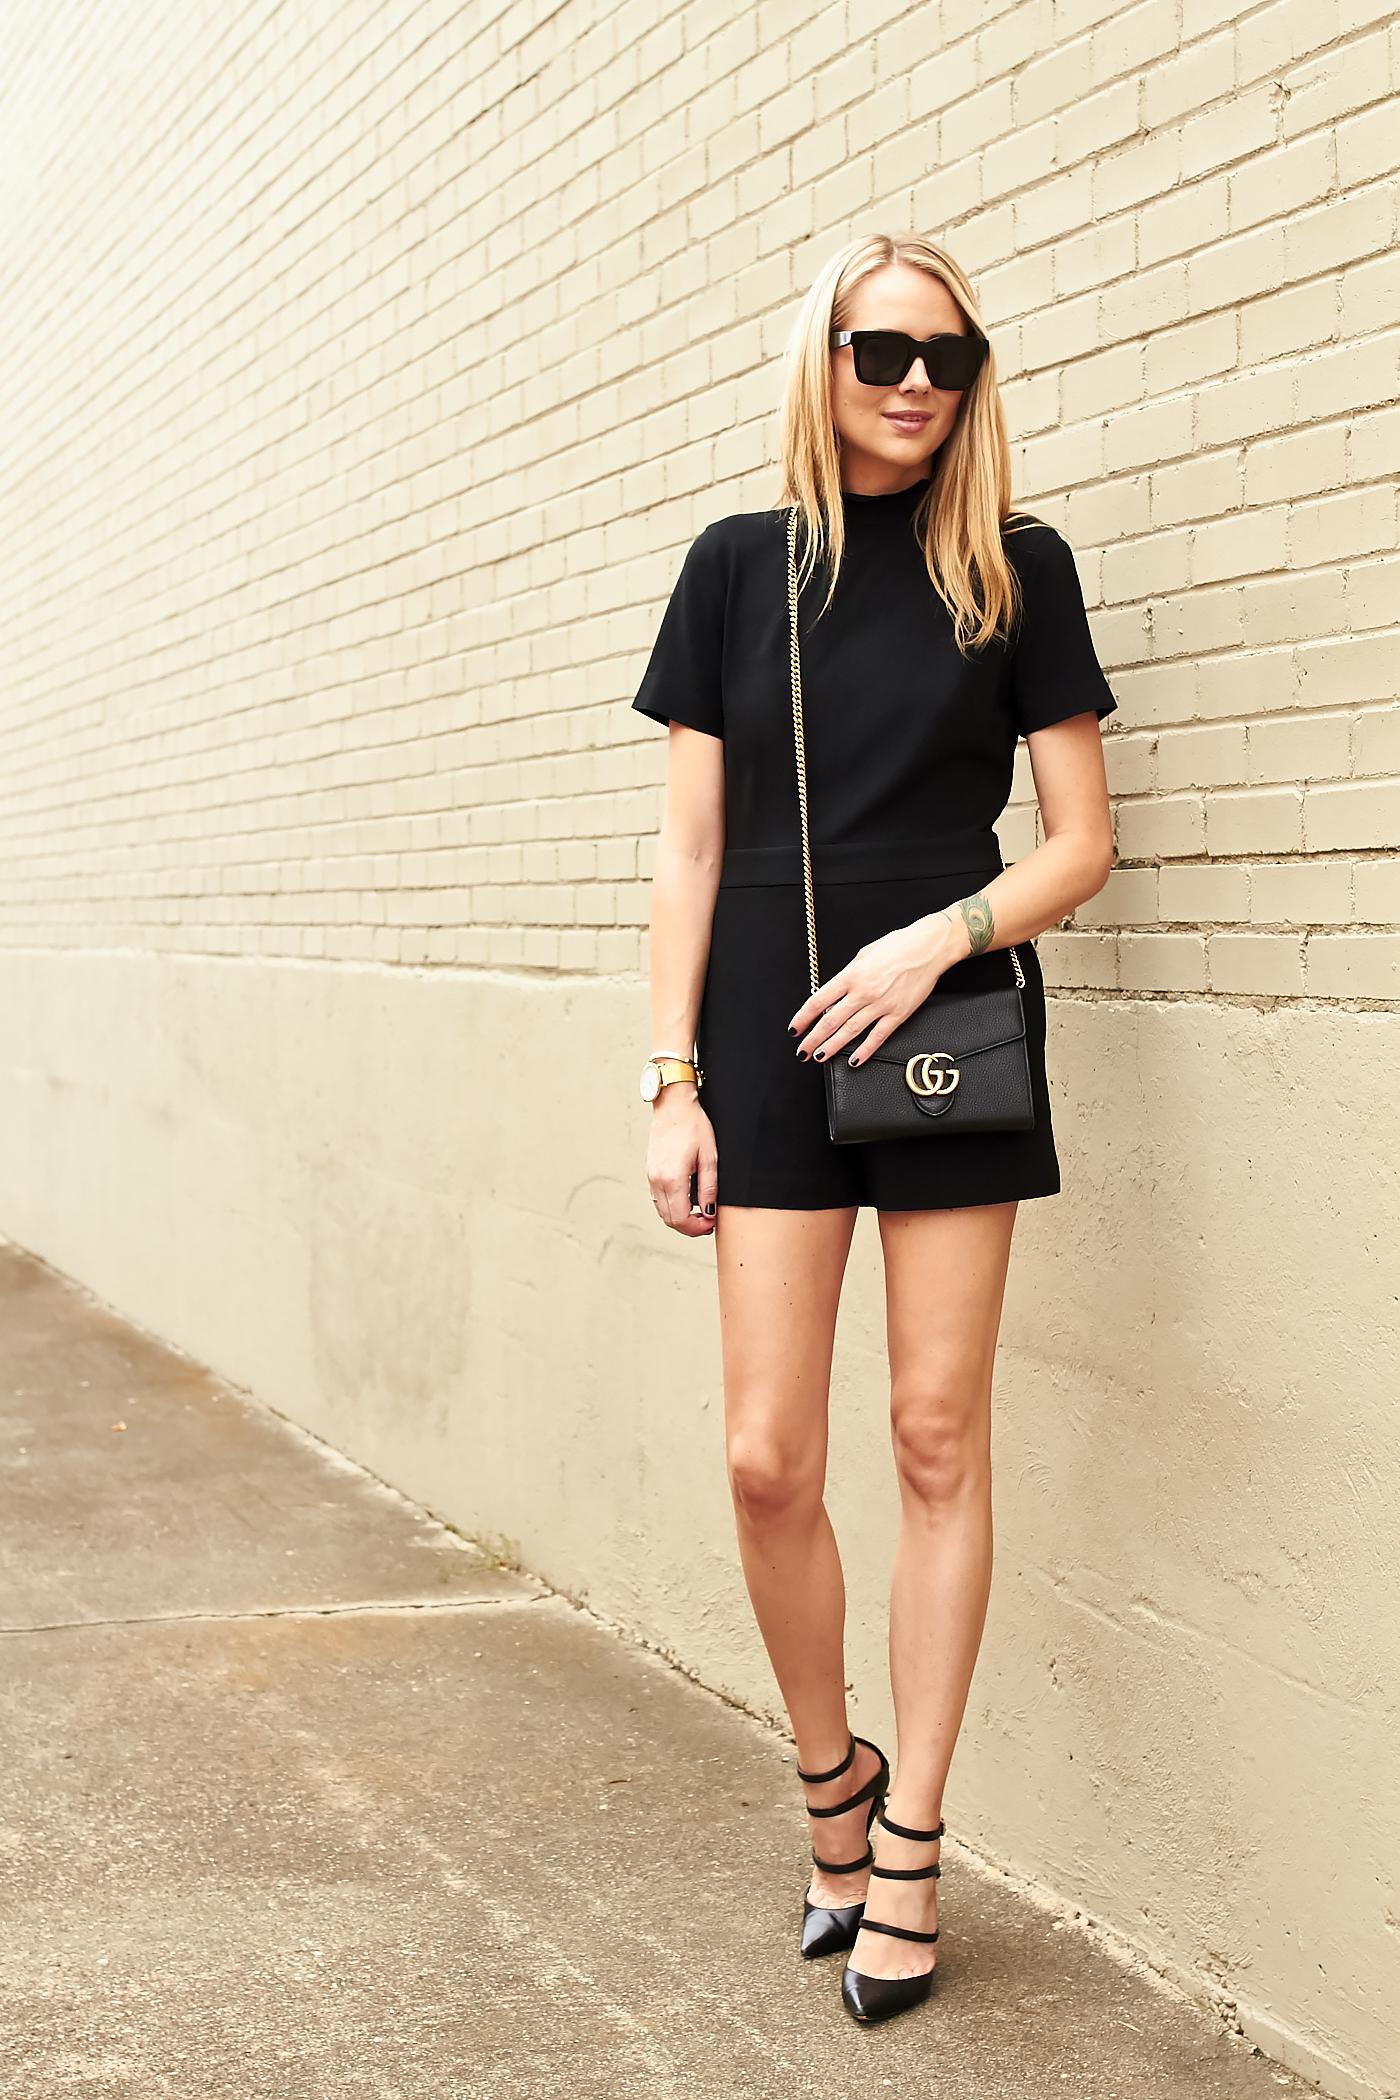 fashion-jackson-club-monaco-black-philena-romper-black-strappy-pumps-gucci-black-marmont-handbag-black-celine-sunglasses